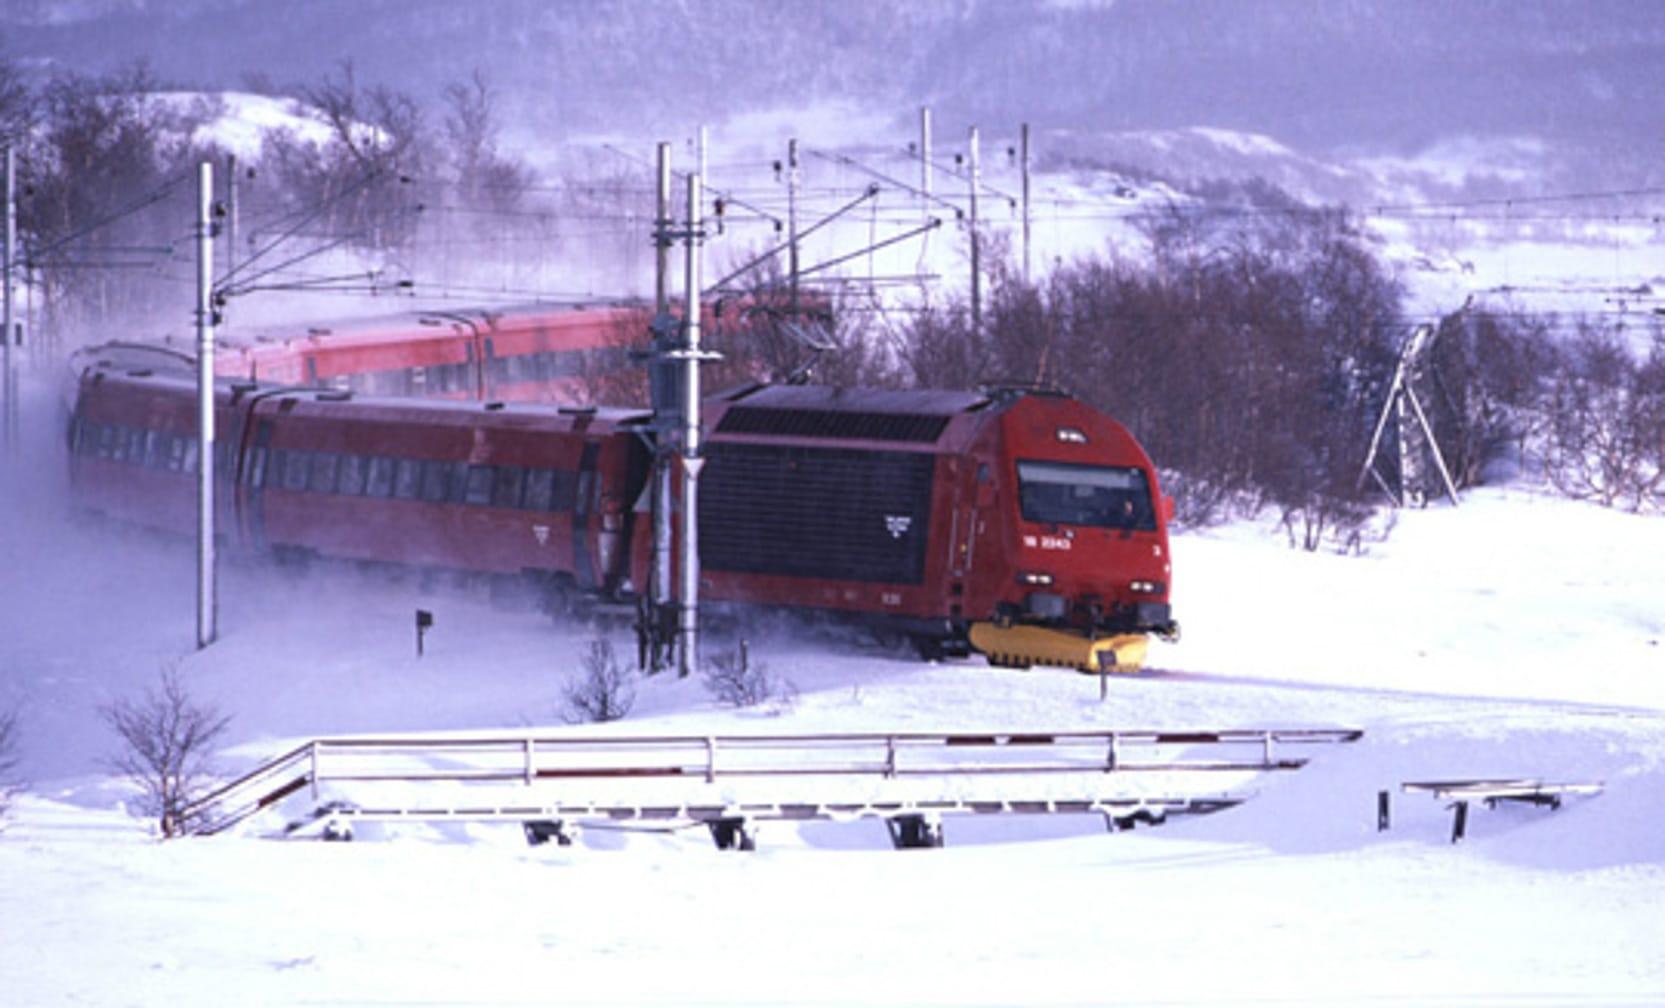 Bergen Railway, Ustaoset. (Photo by Rune Fossum)